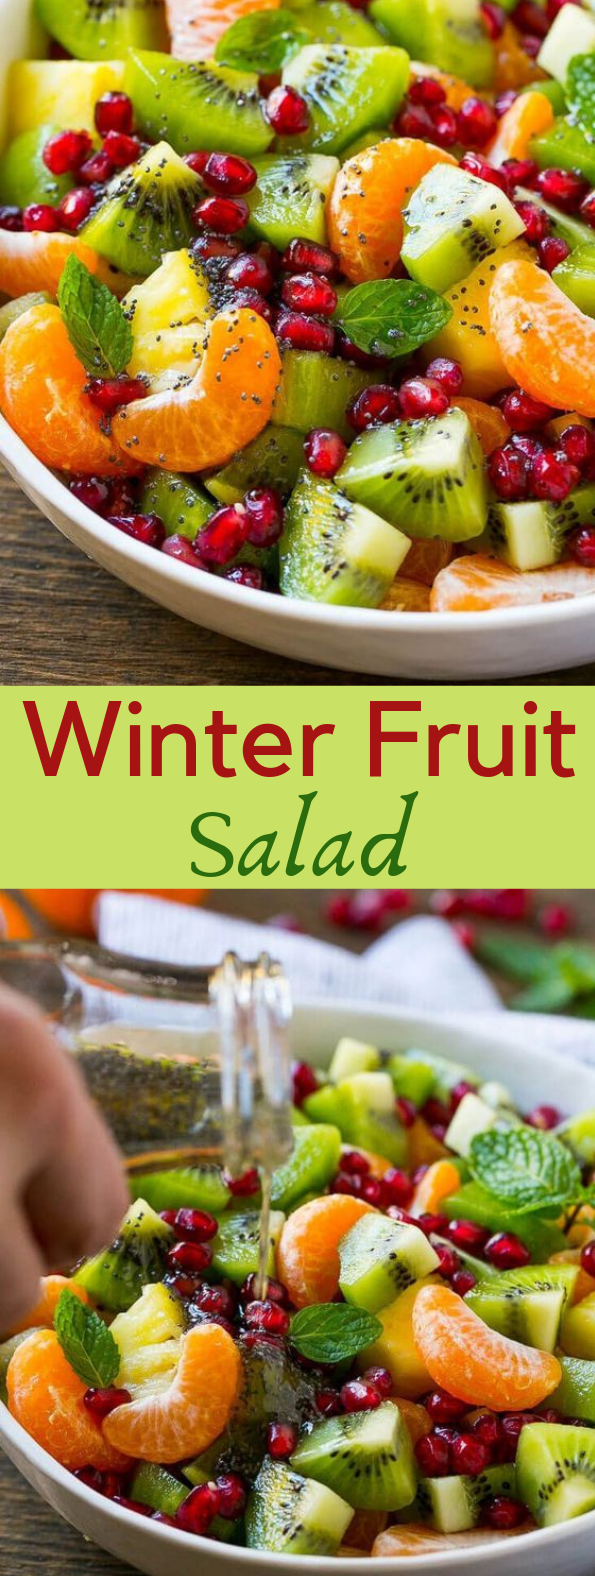 WINTER FRUIT SALAD #salad #diet